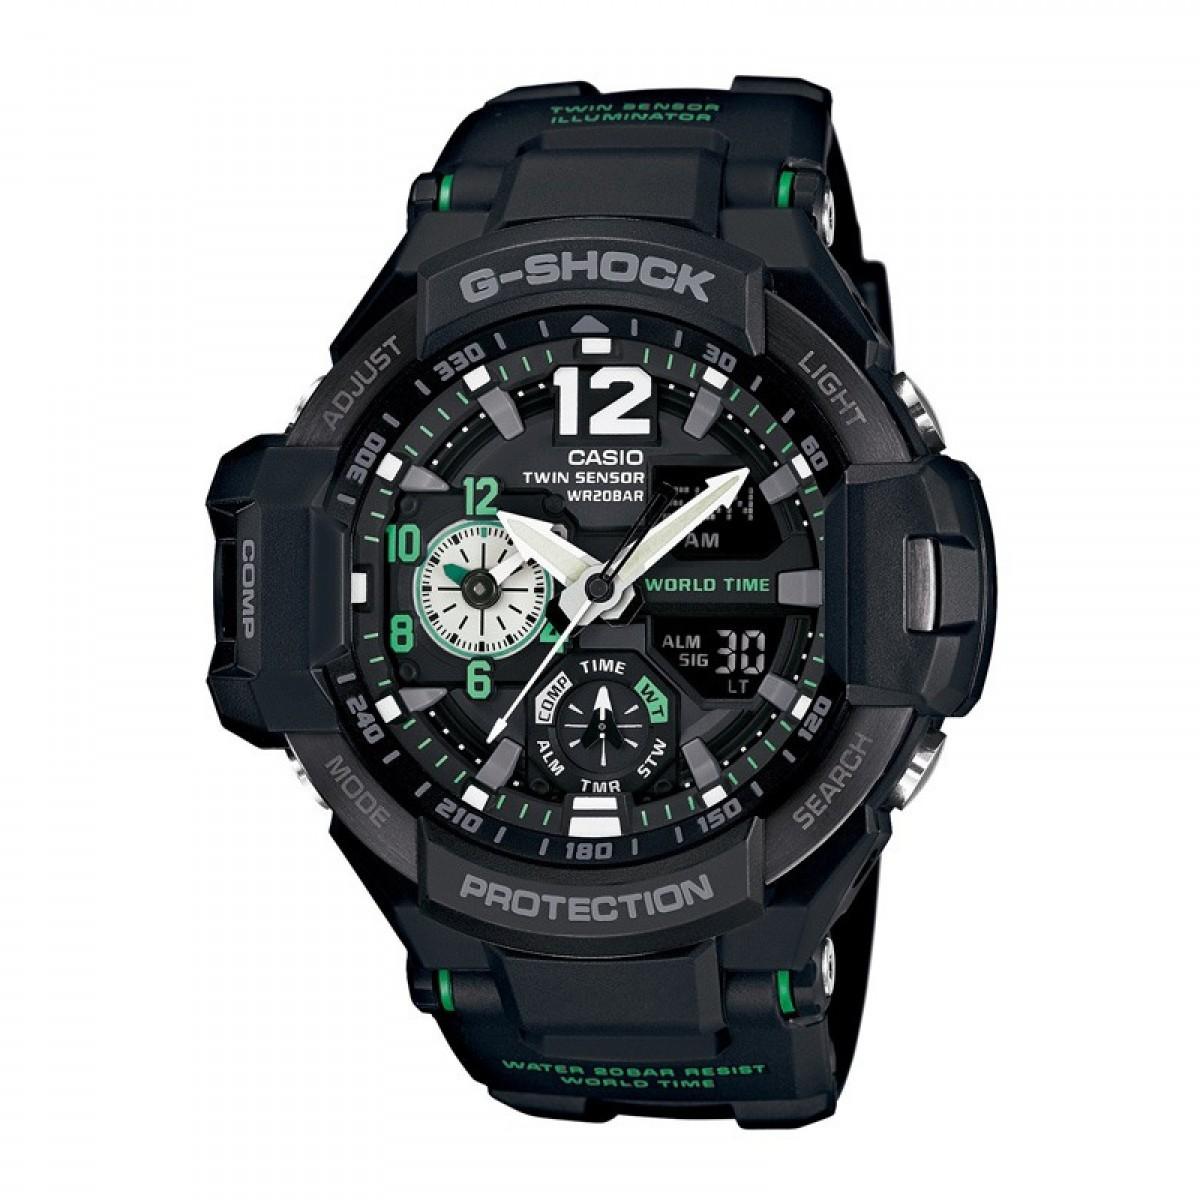 Часовник Casio G-Shock Gravitymaster GA-1100-1A3ER